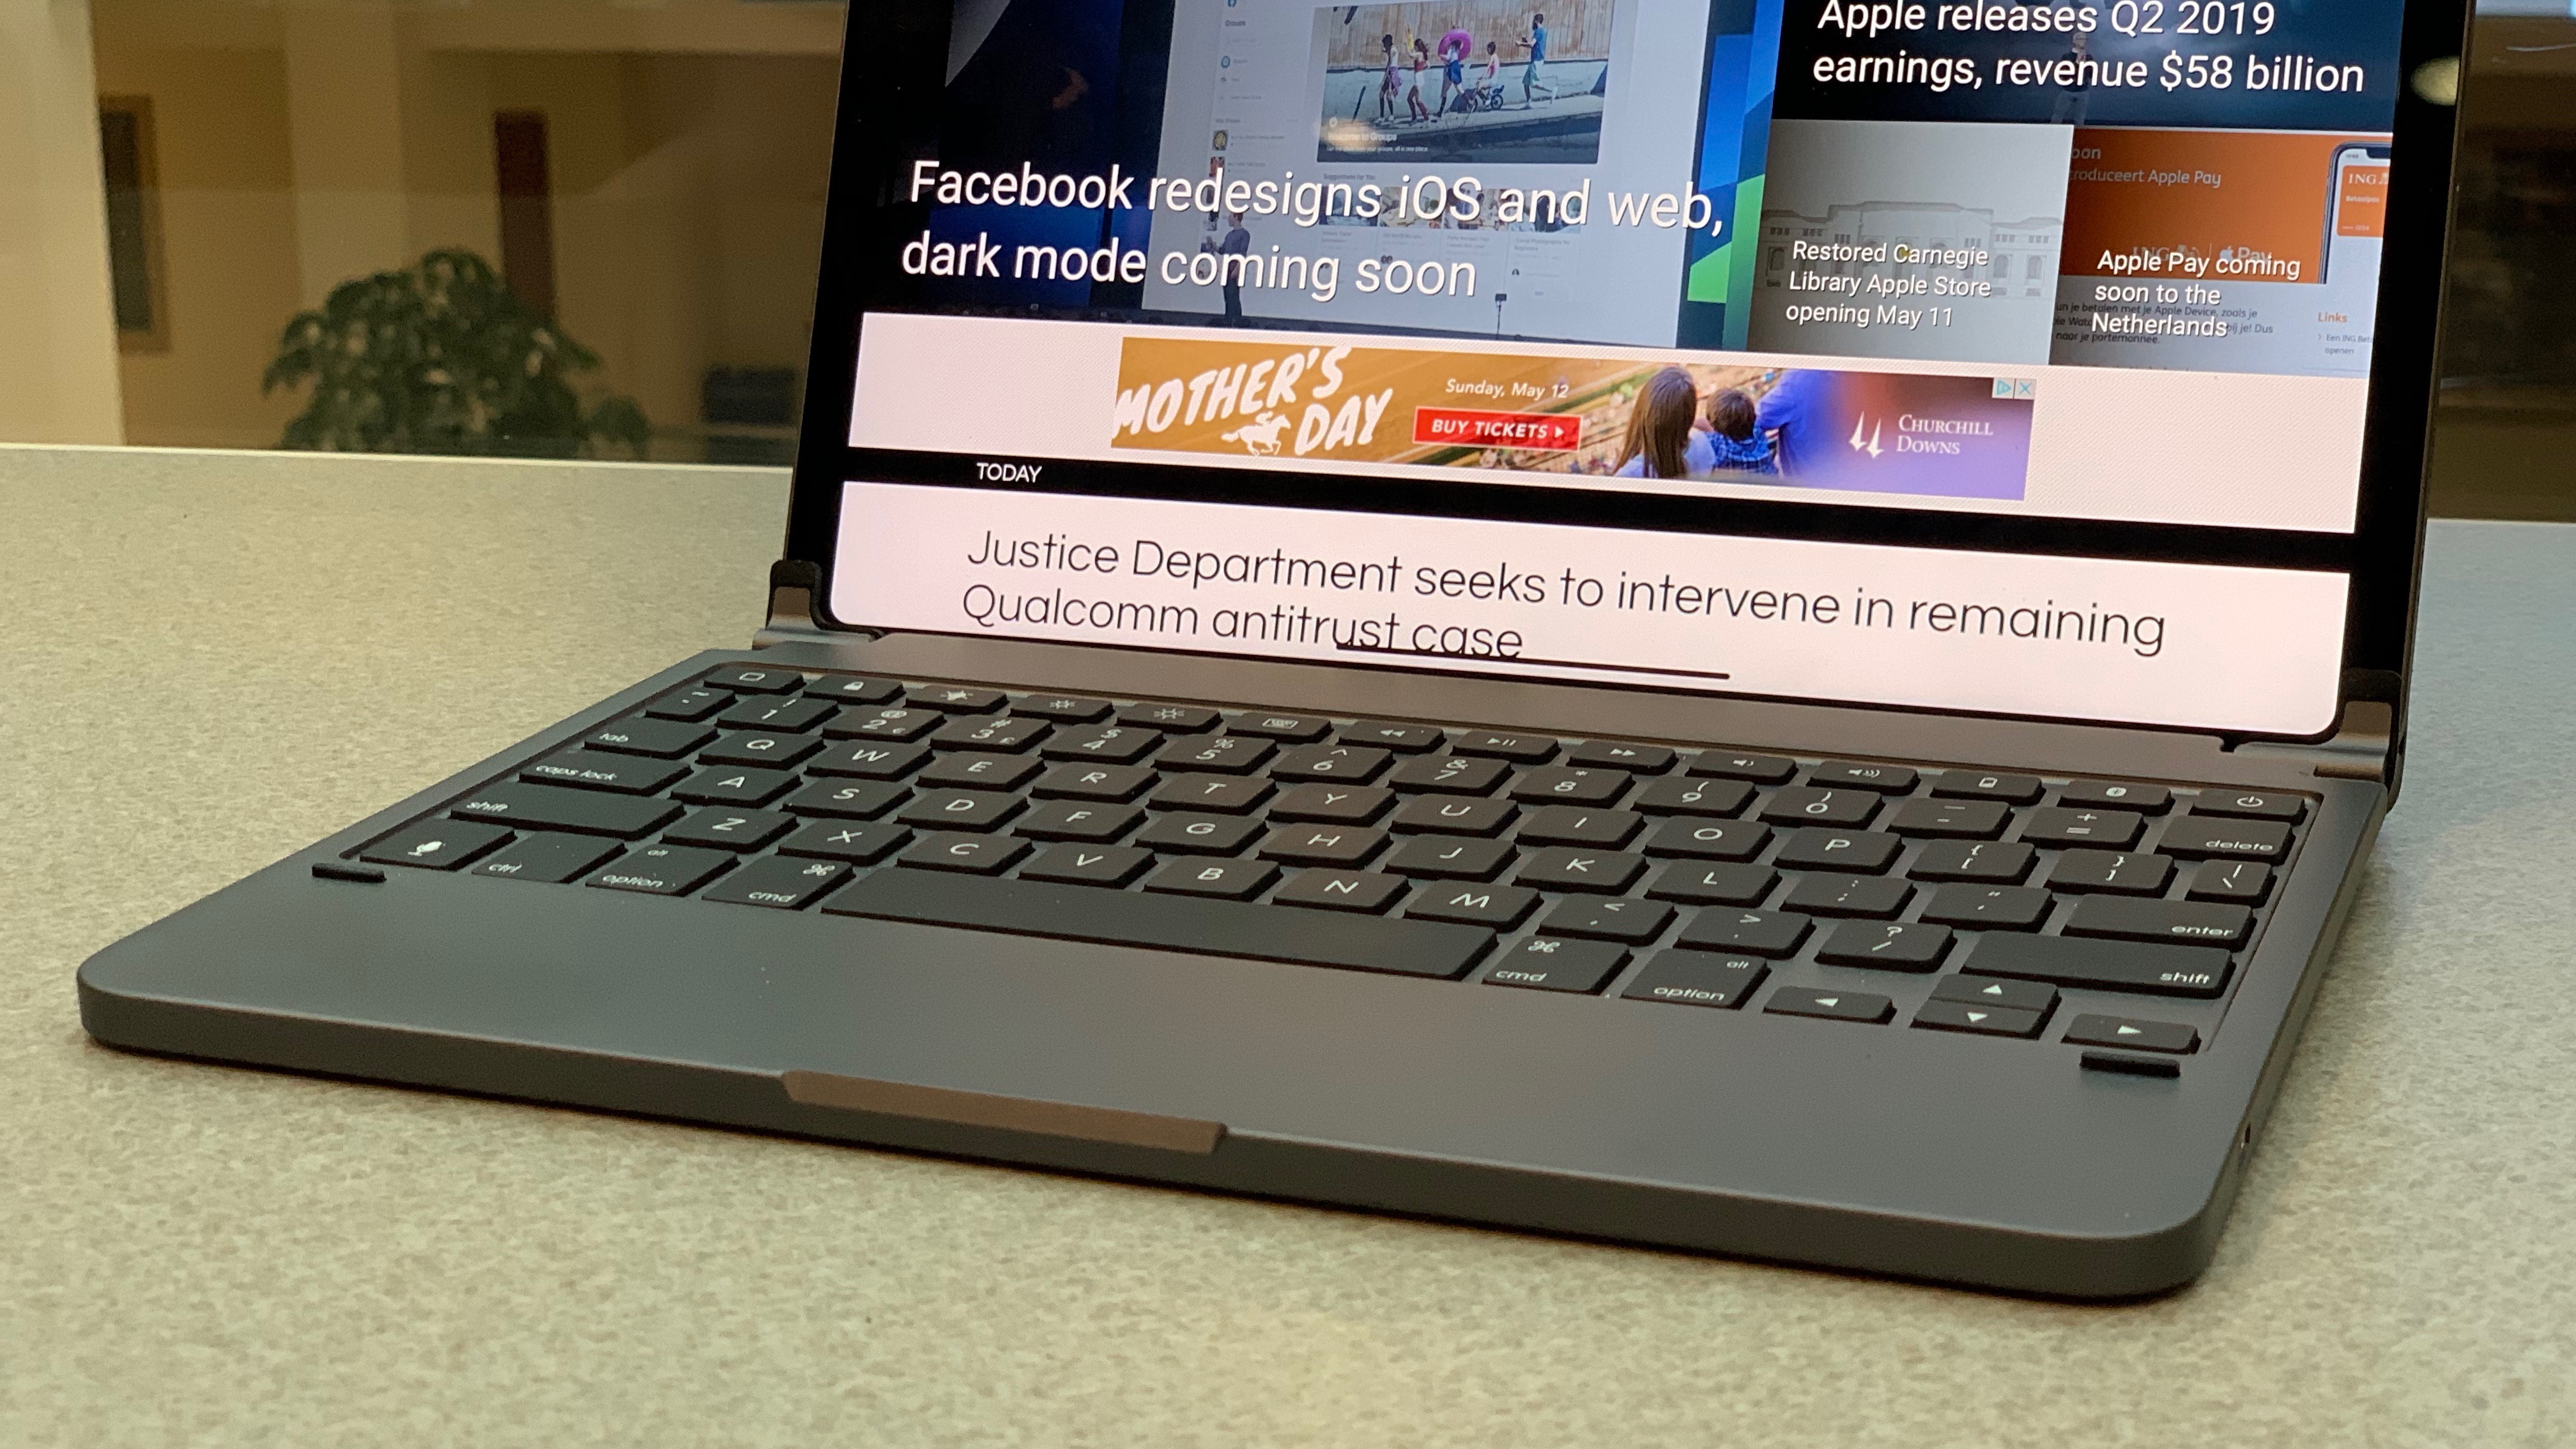 Brydge Keyboard vs Smart Keyboard for iPad Pro - 9to5Mac